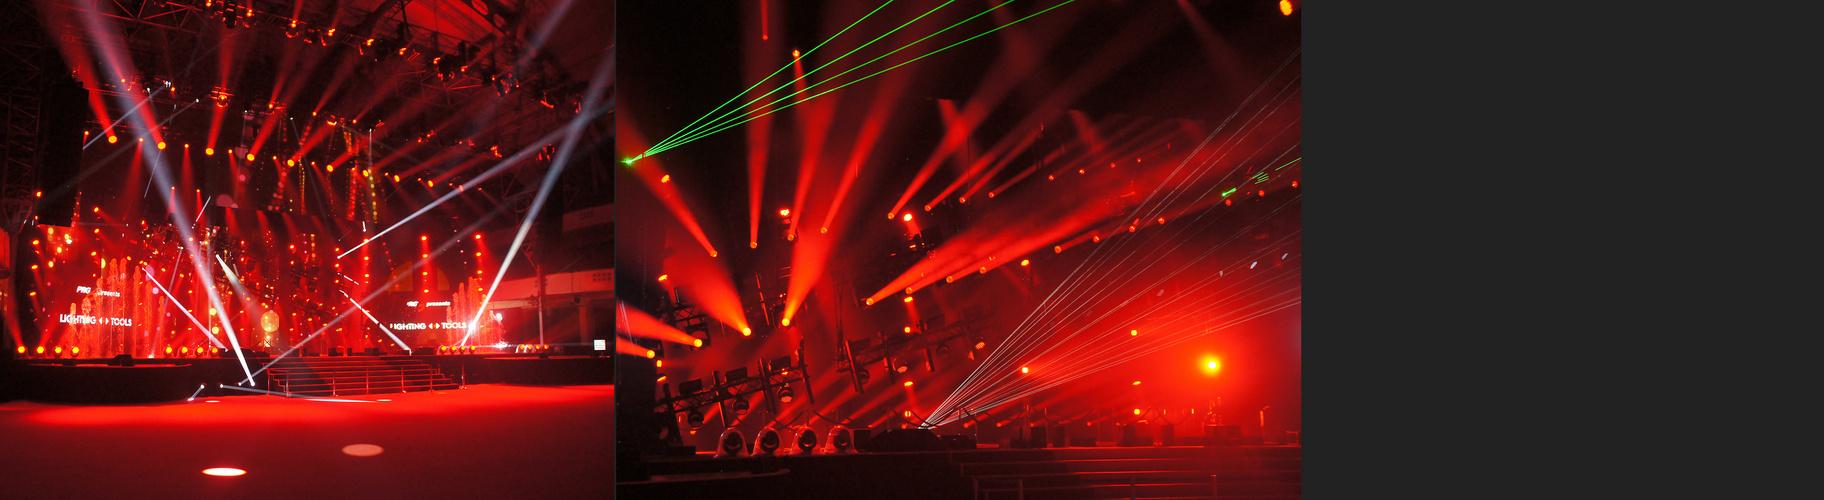 PRG Light and Sound Show: rotes Flutlicht